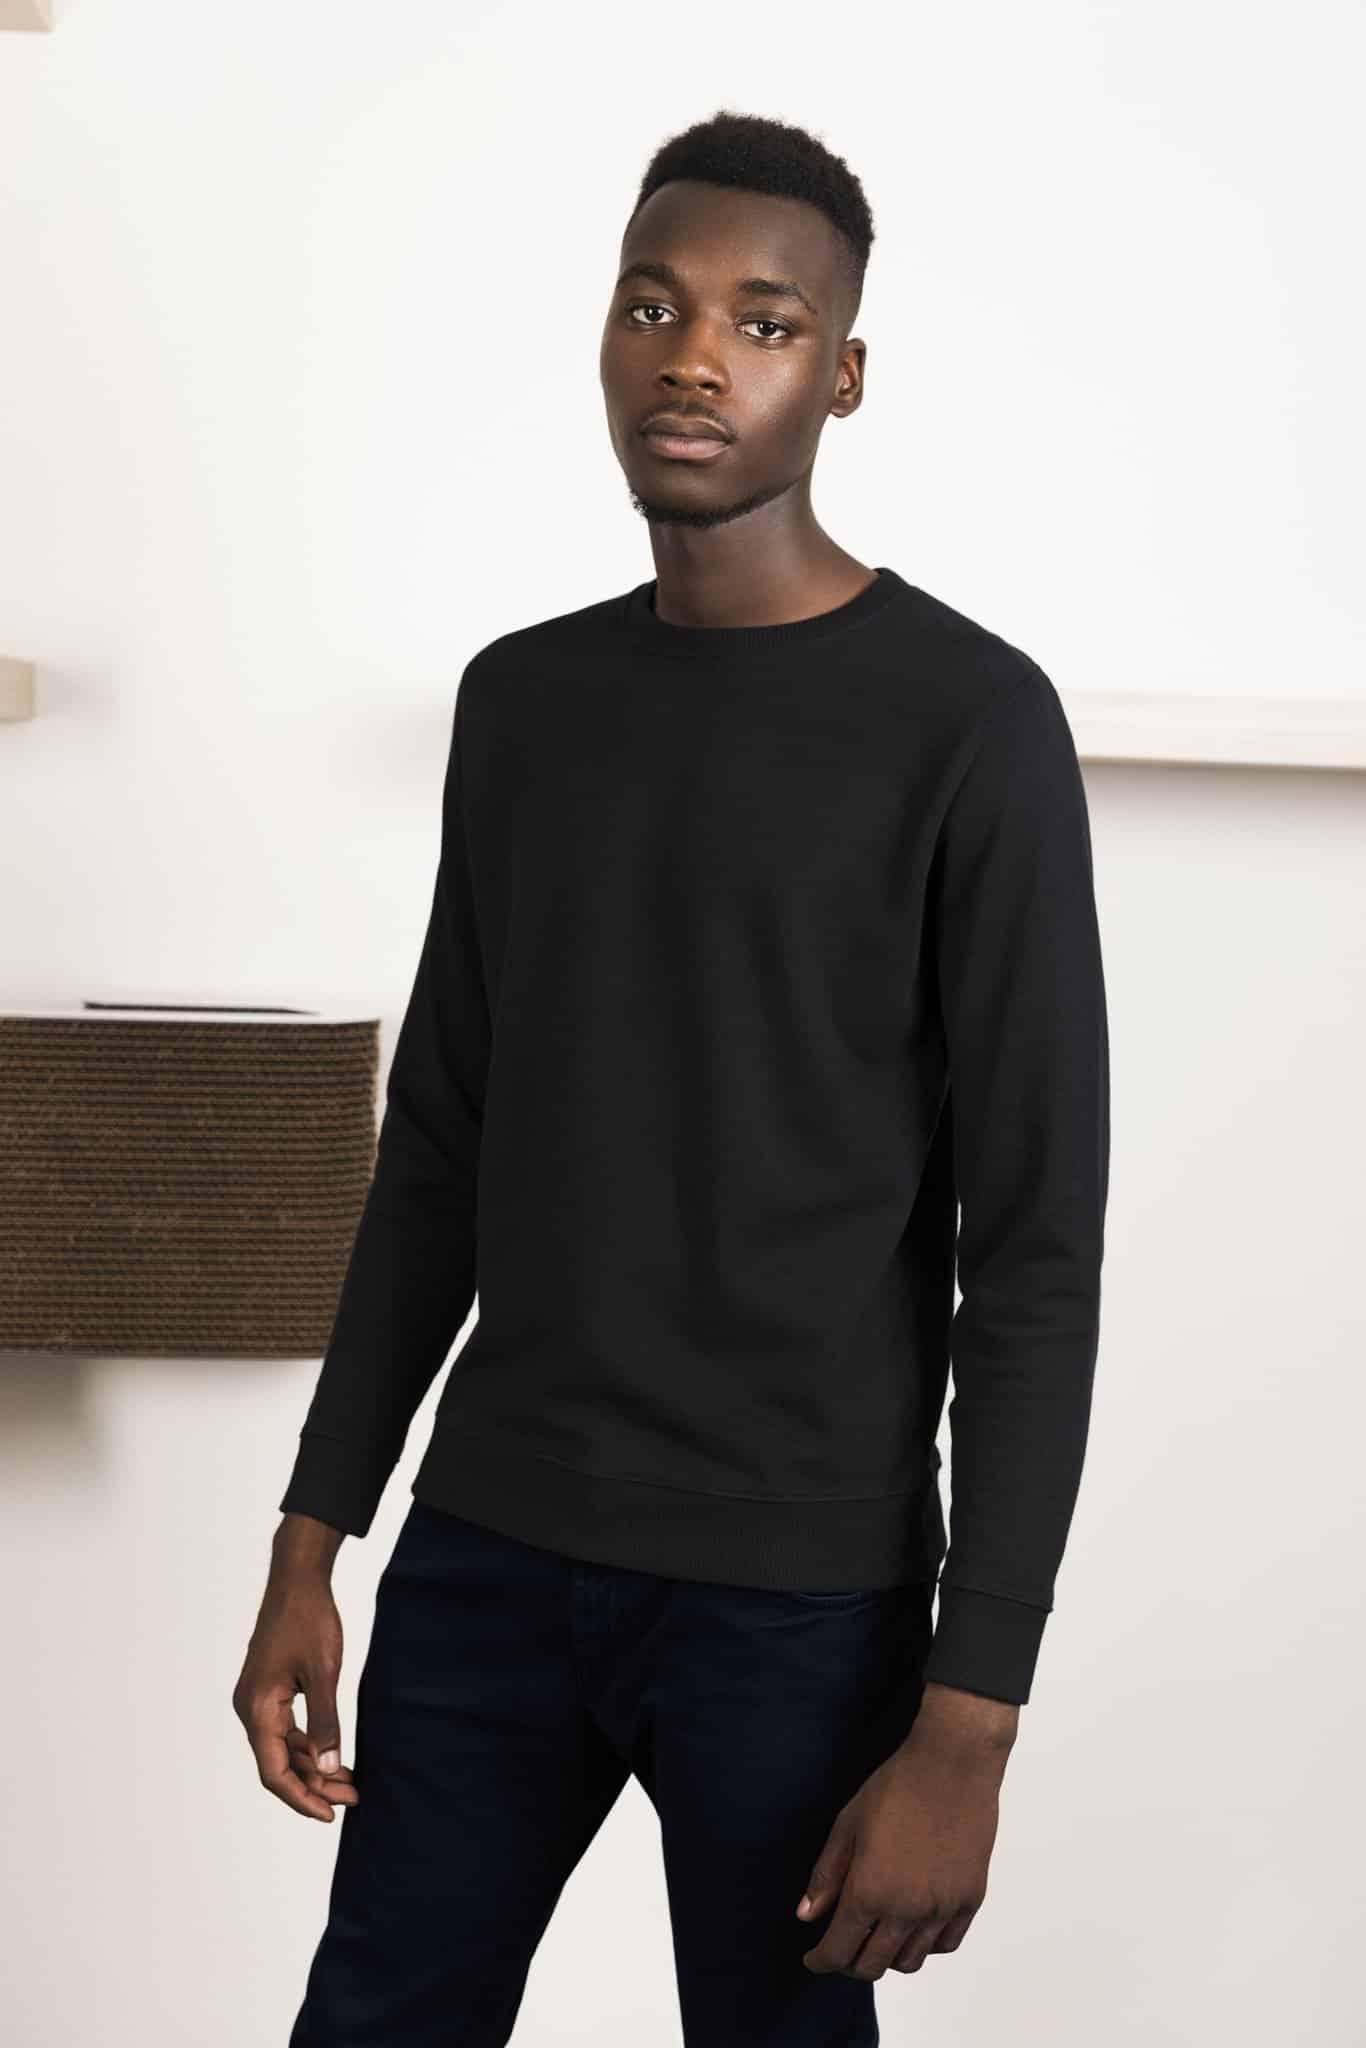 sudadera negro moda ropa hombre basus corcho negro district black